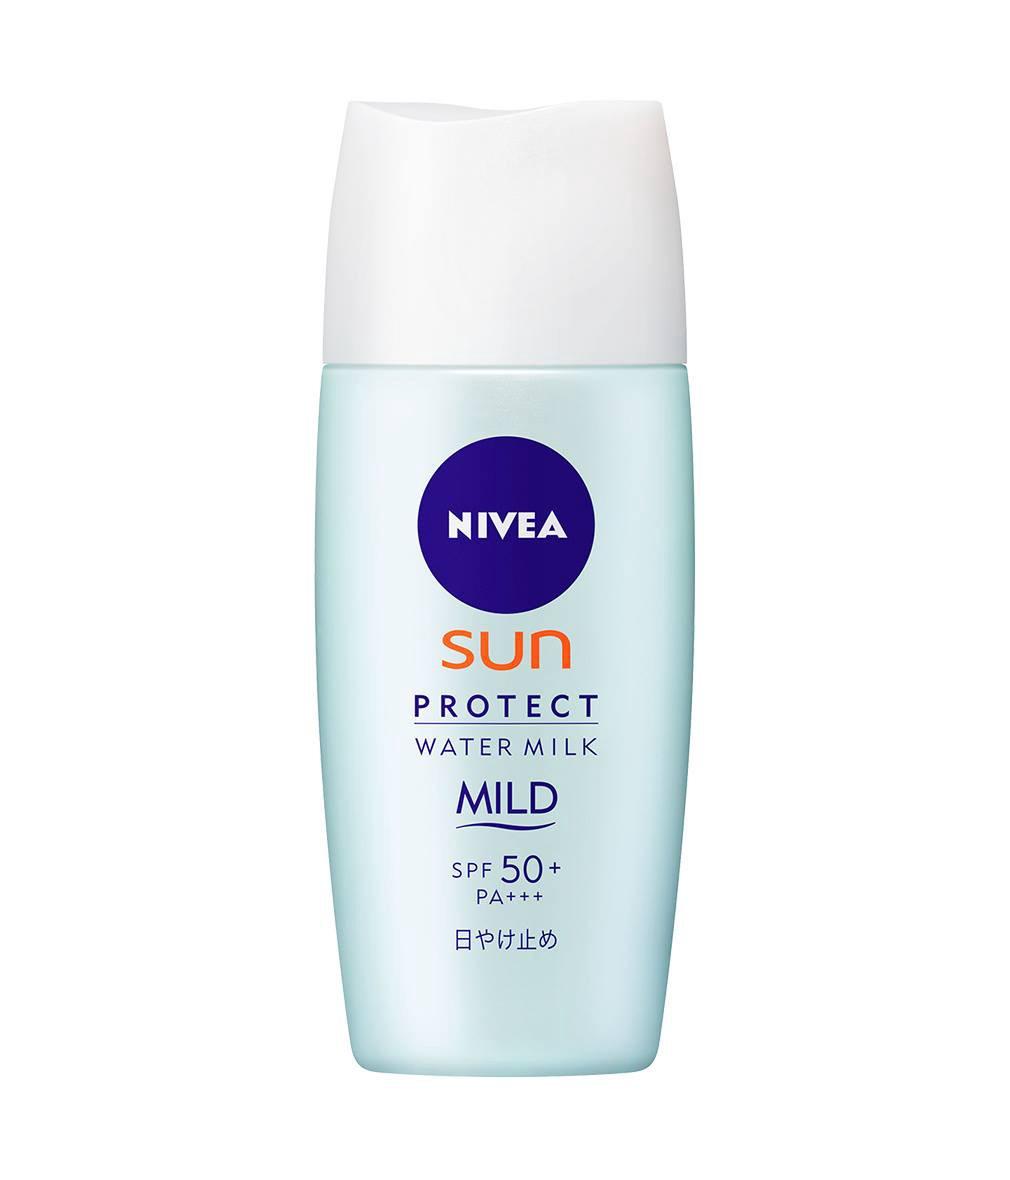 Best Sunscreen 2020.Best Japanese Sunscreens For Sensitive Skin 2020 Japan Web